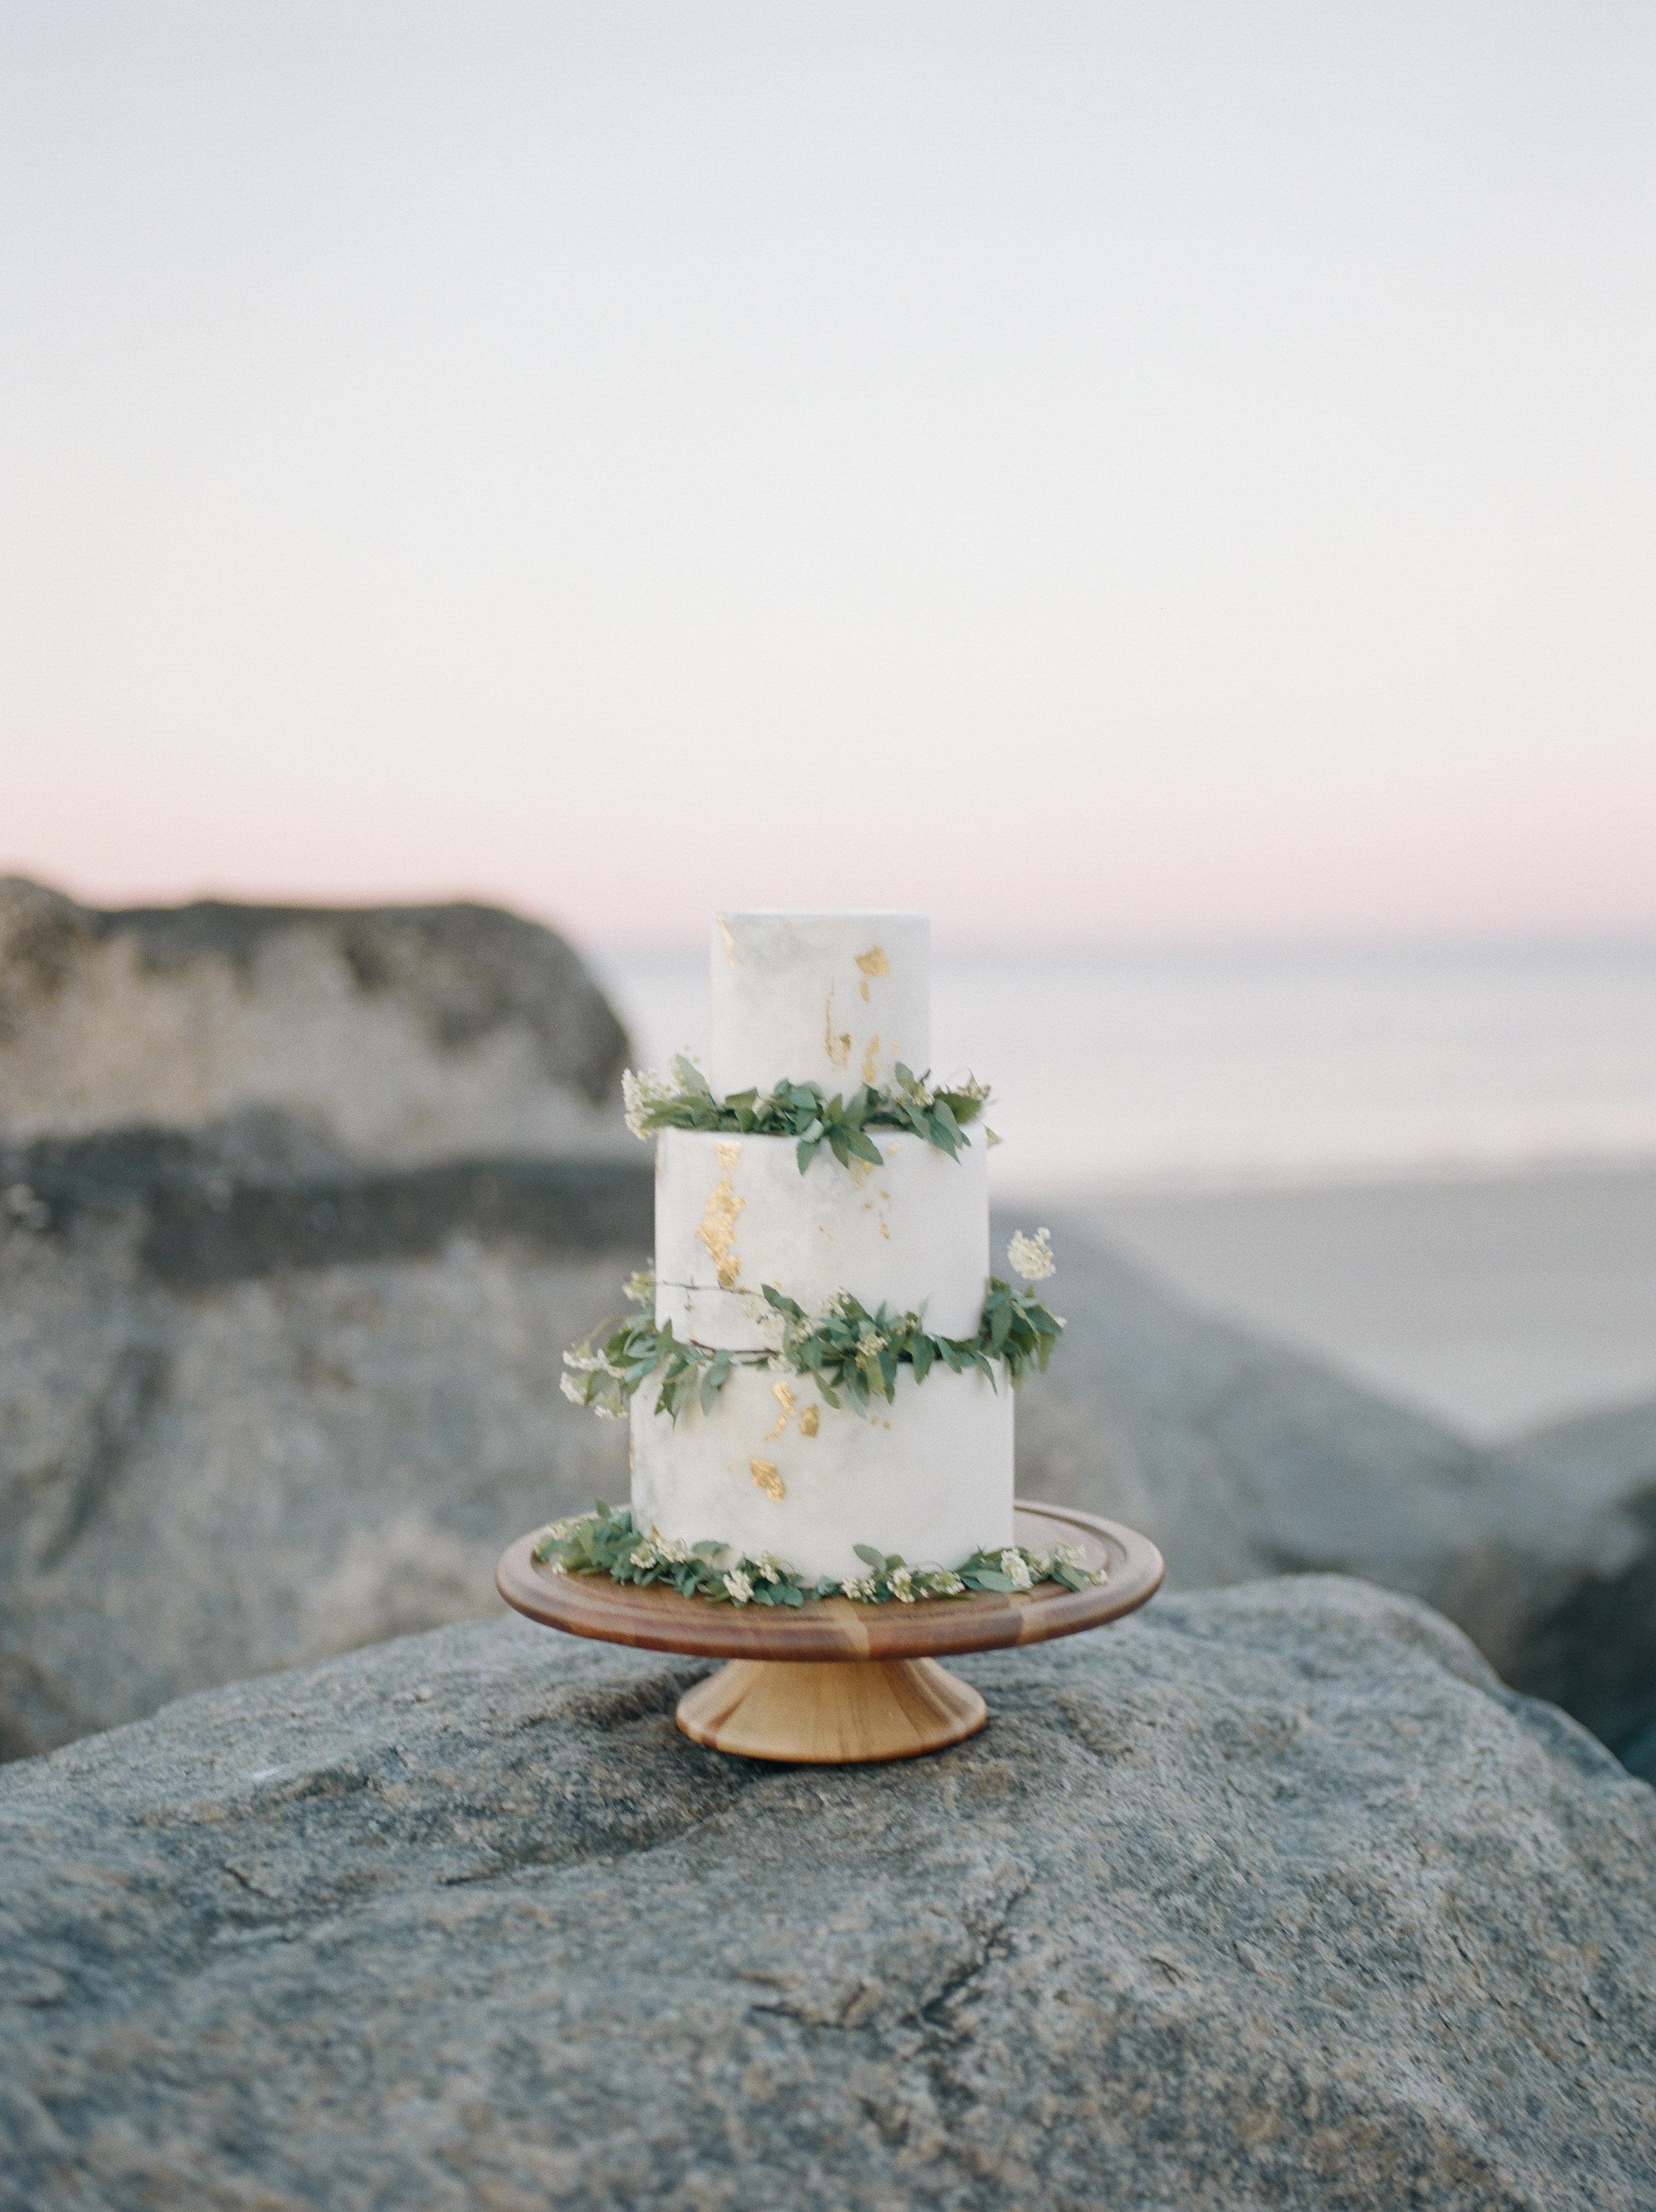 Savannah Wedding Inspiration | Beach Wedding Inspiration | Organic Wedding Cake | White and Gold Wedding Cake | Gold Foil Wedding Cake | Organic Beach Wedding | Lyndi and Jason Photography | Joy Wed